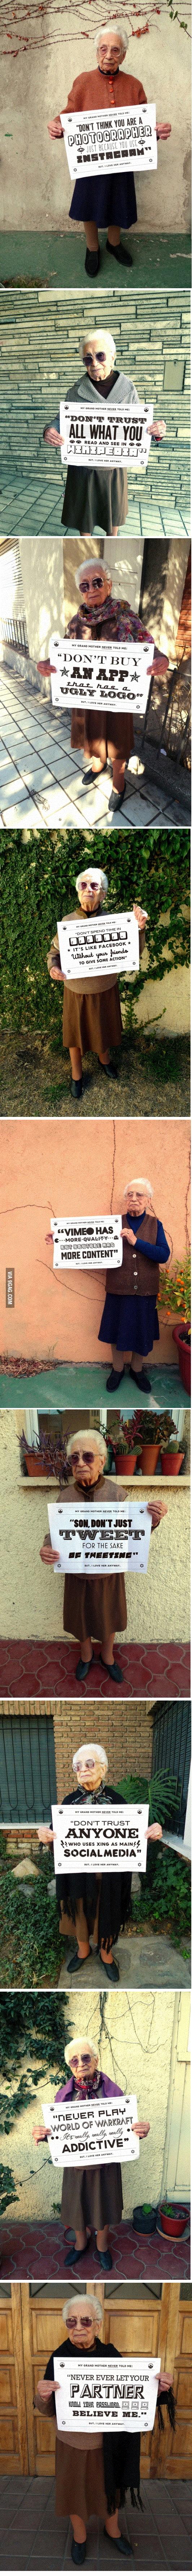 Epic Grandma Advices are Epic